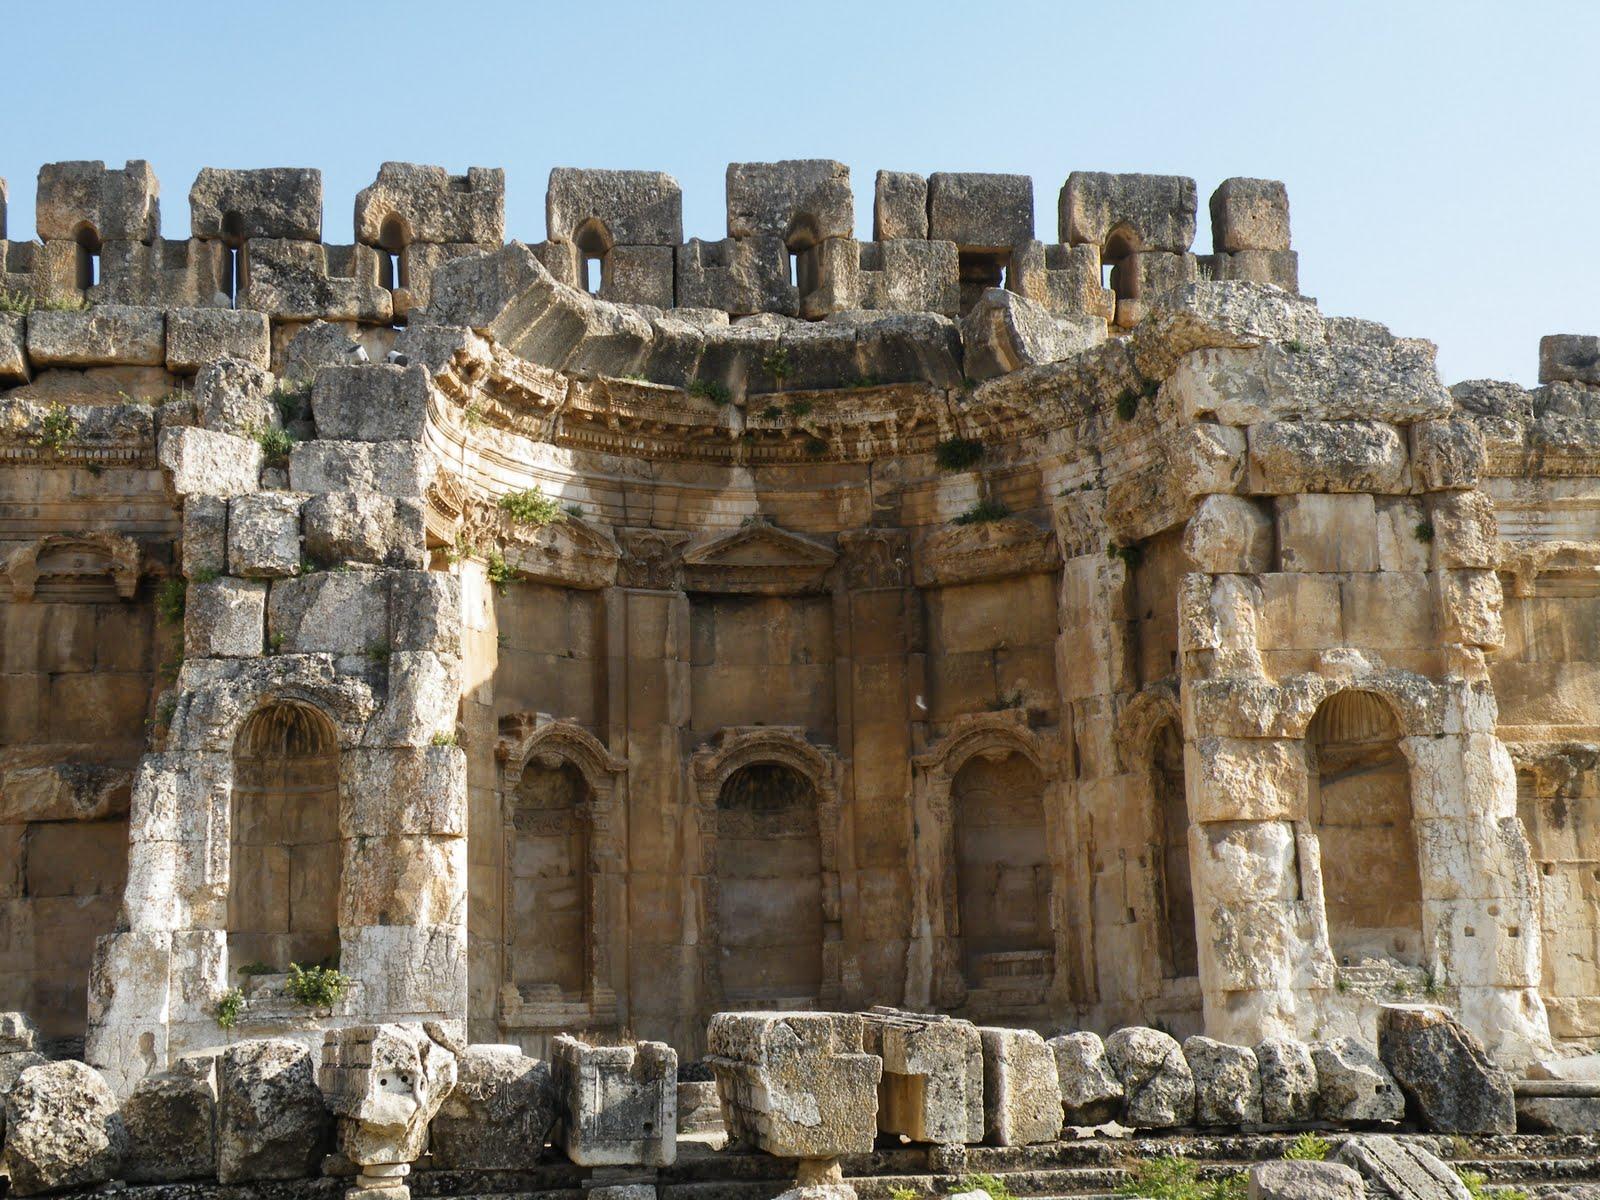 Aleppo Baalbek